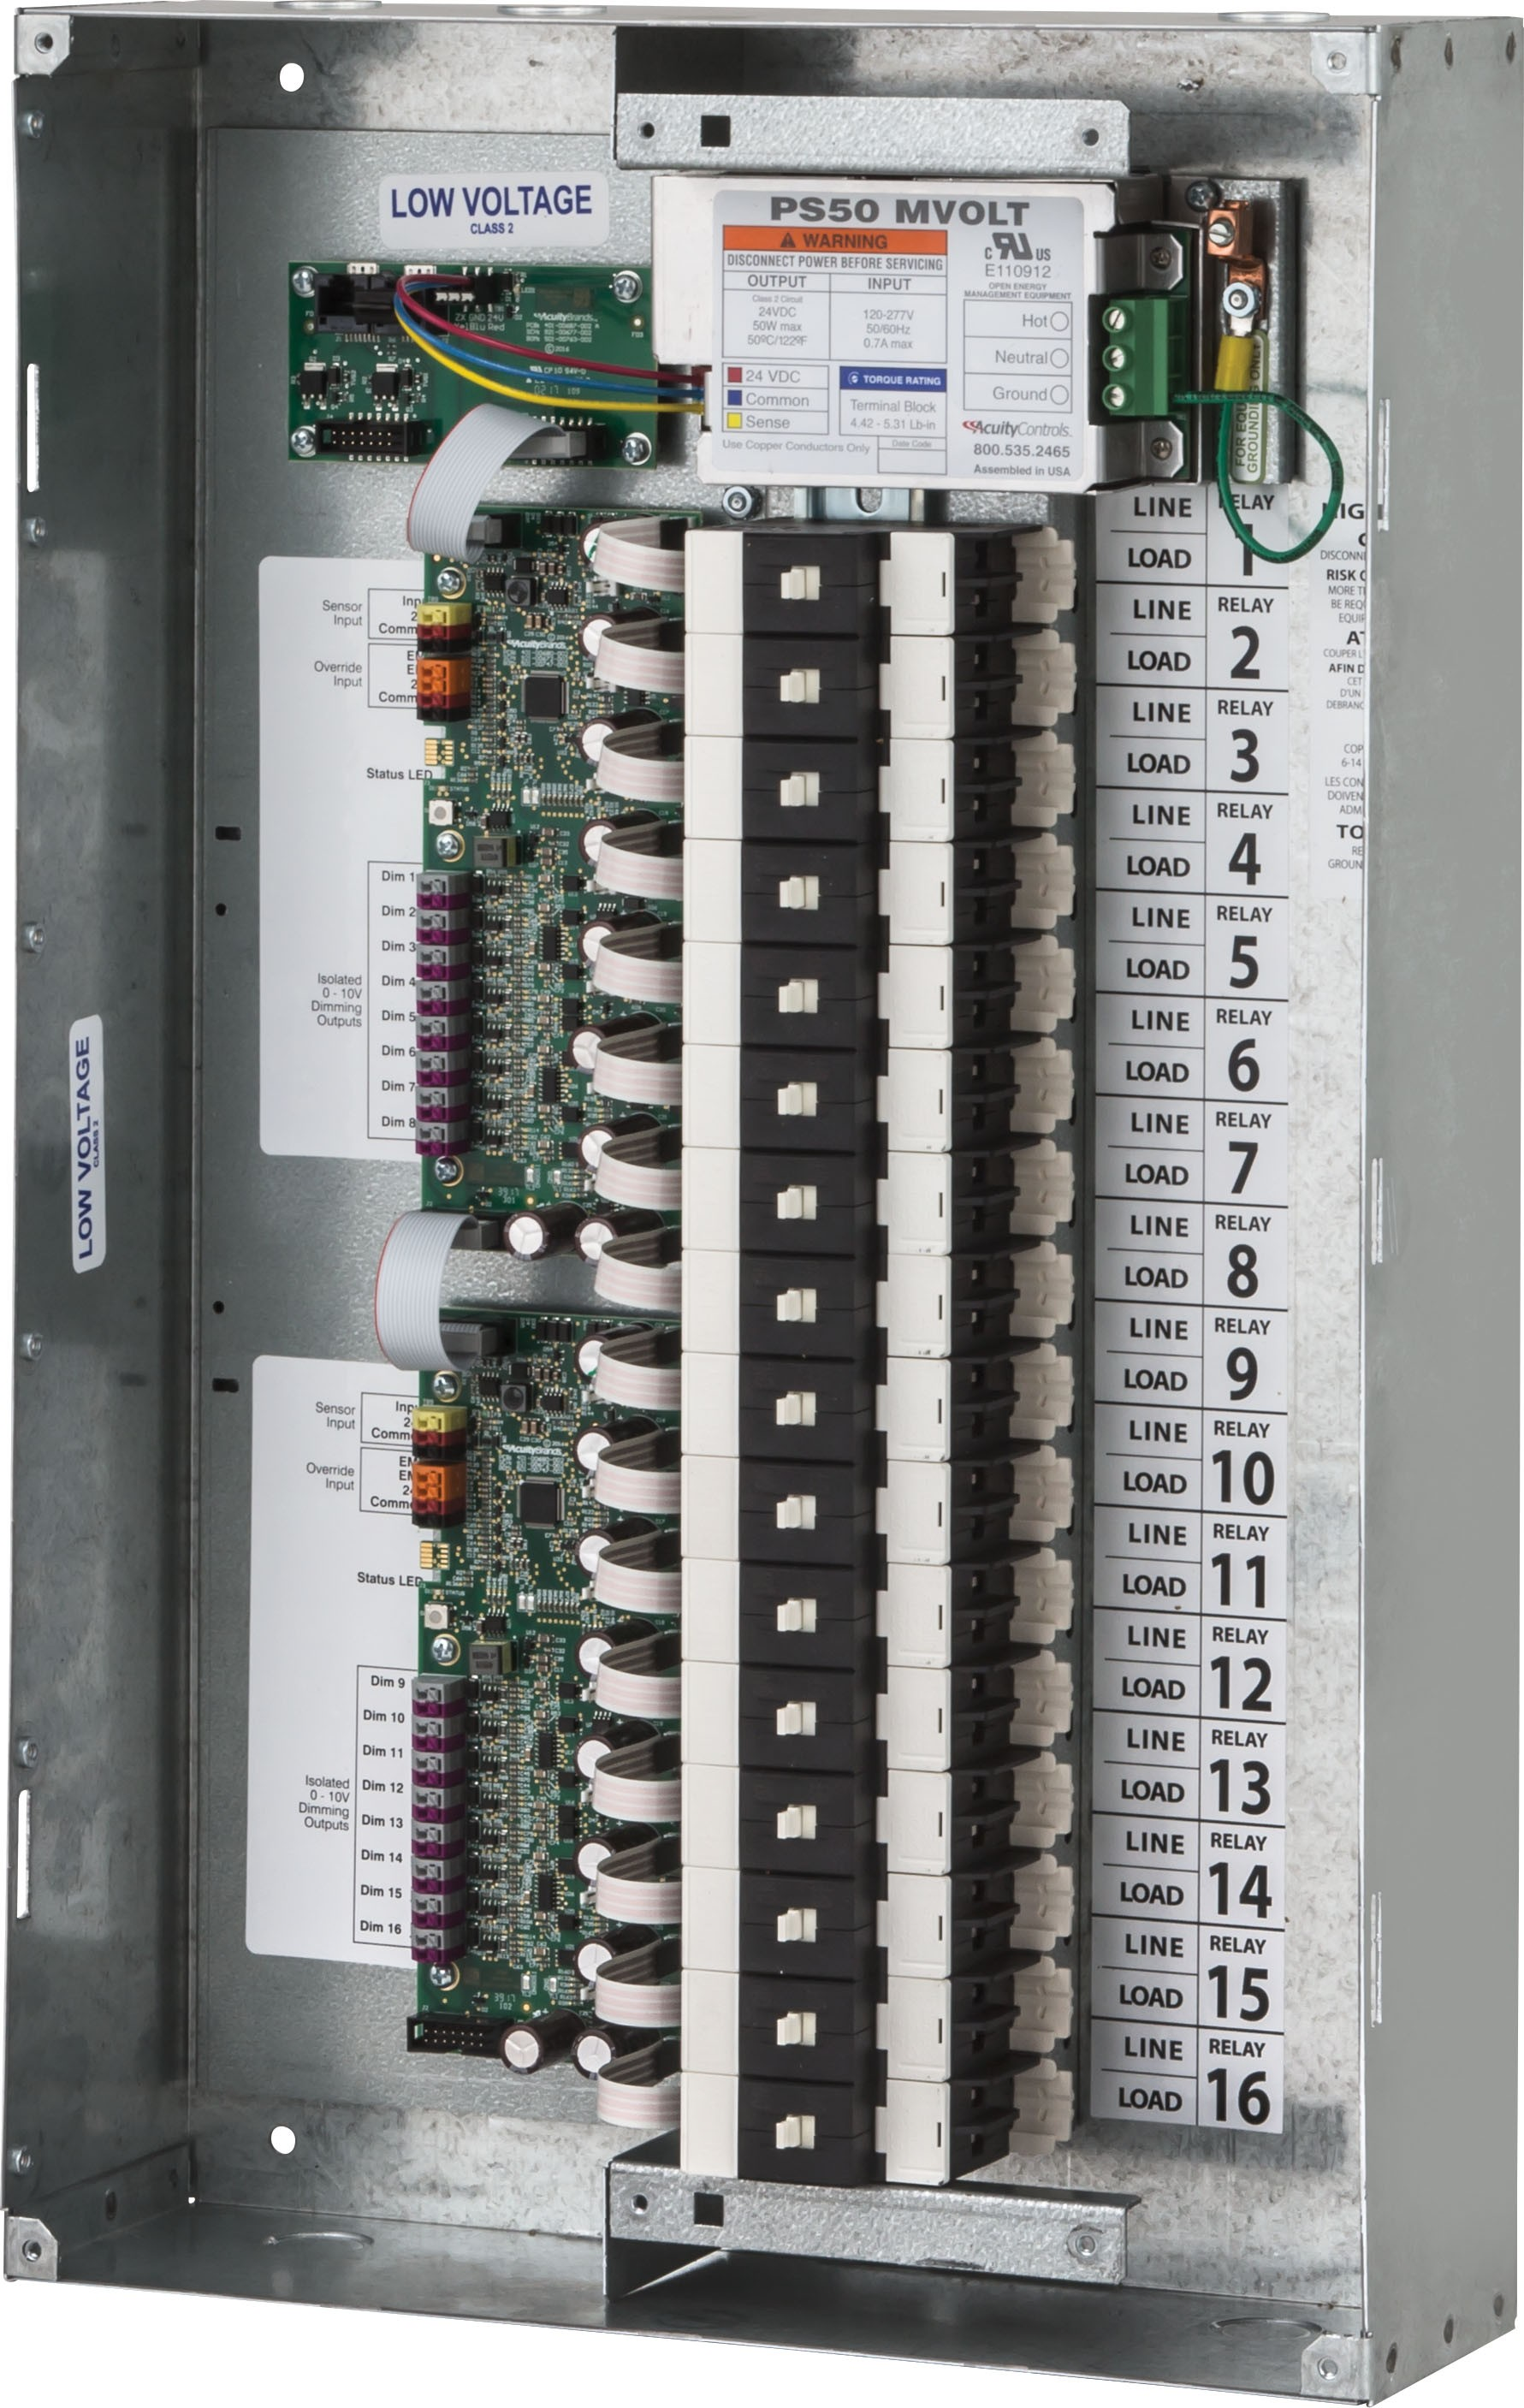 nlight arp relay panel 16 left facing interior sans cover